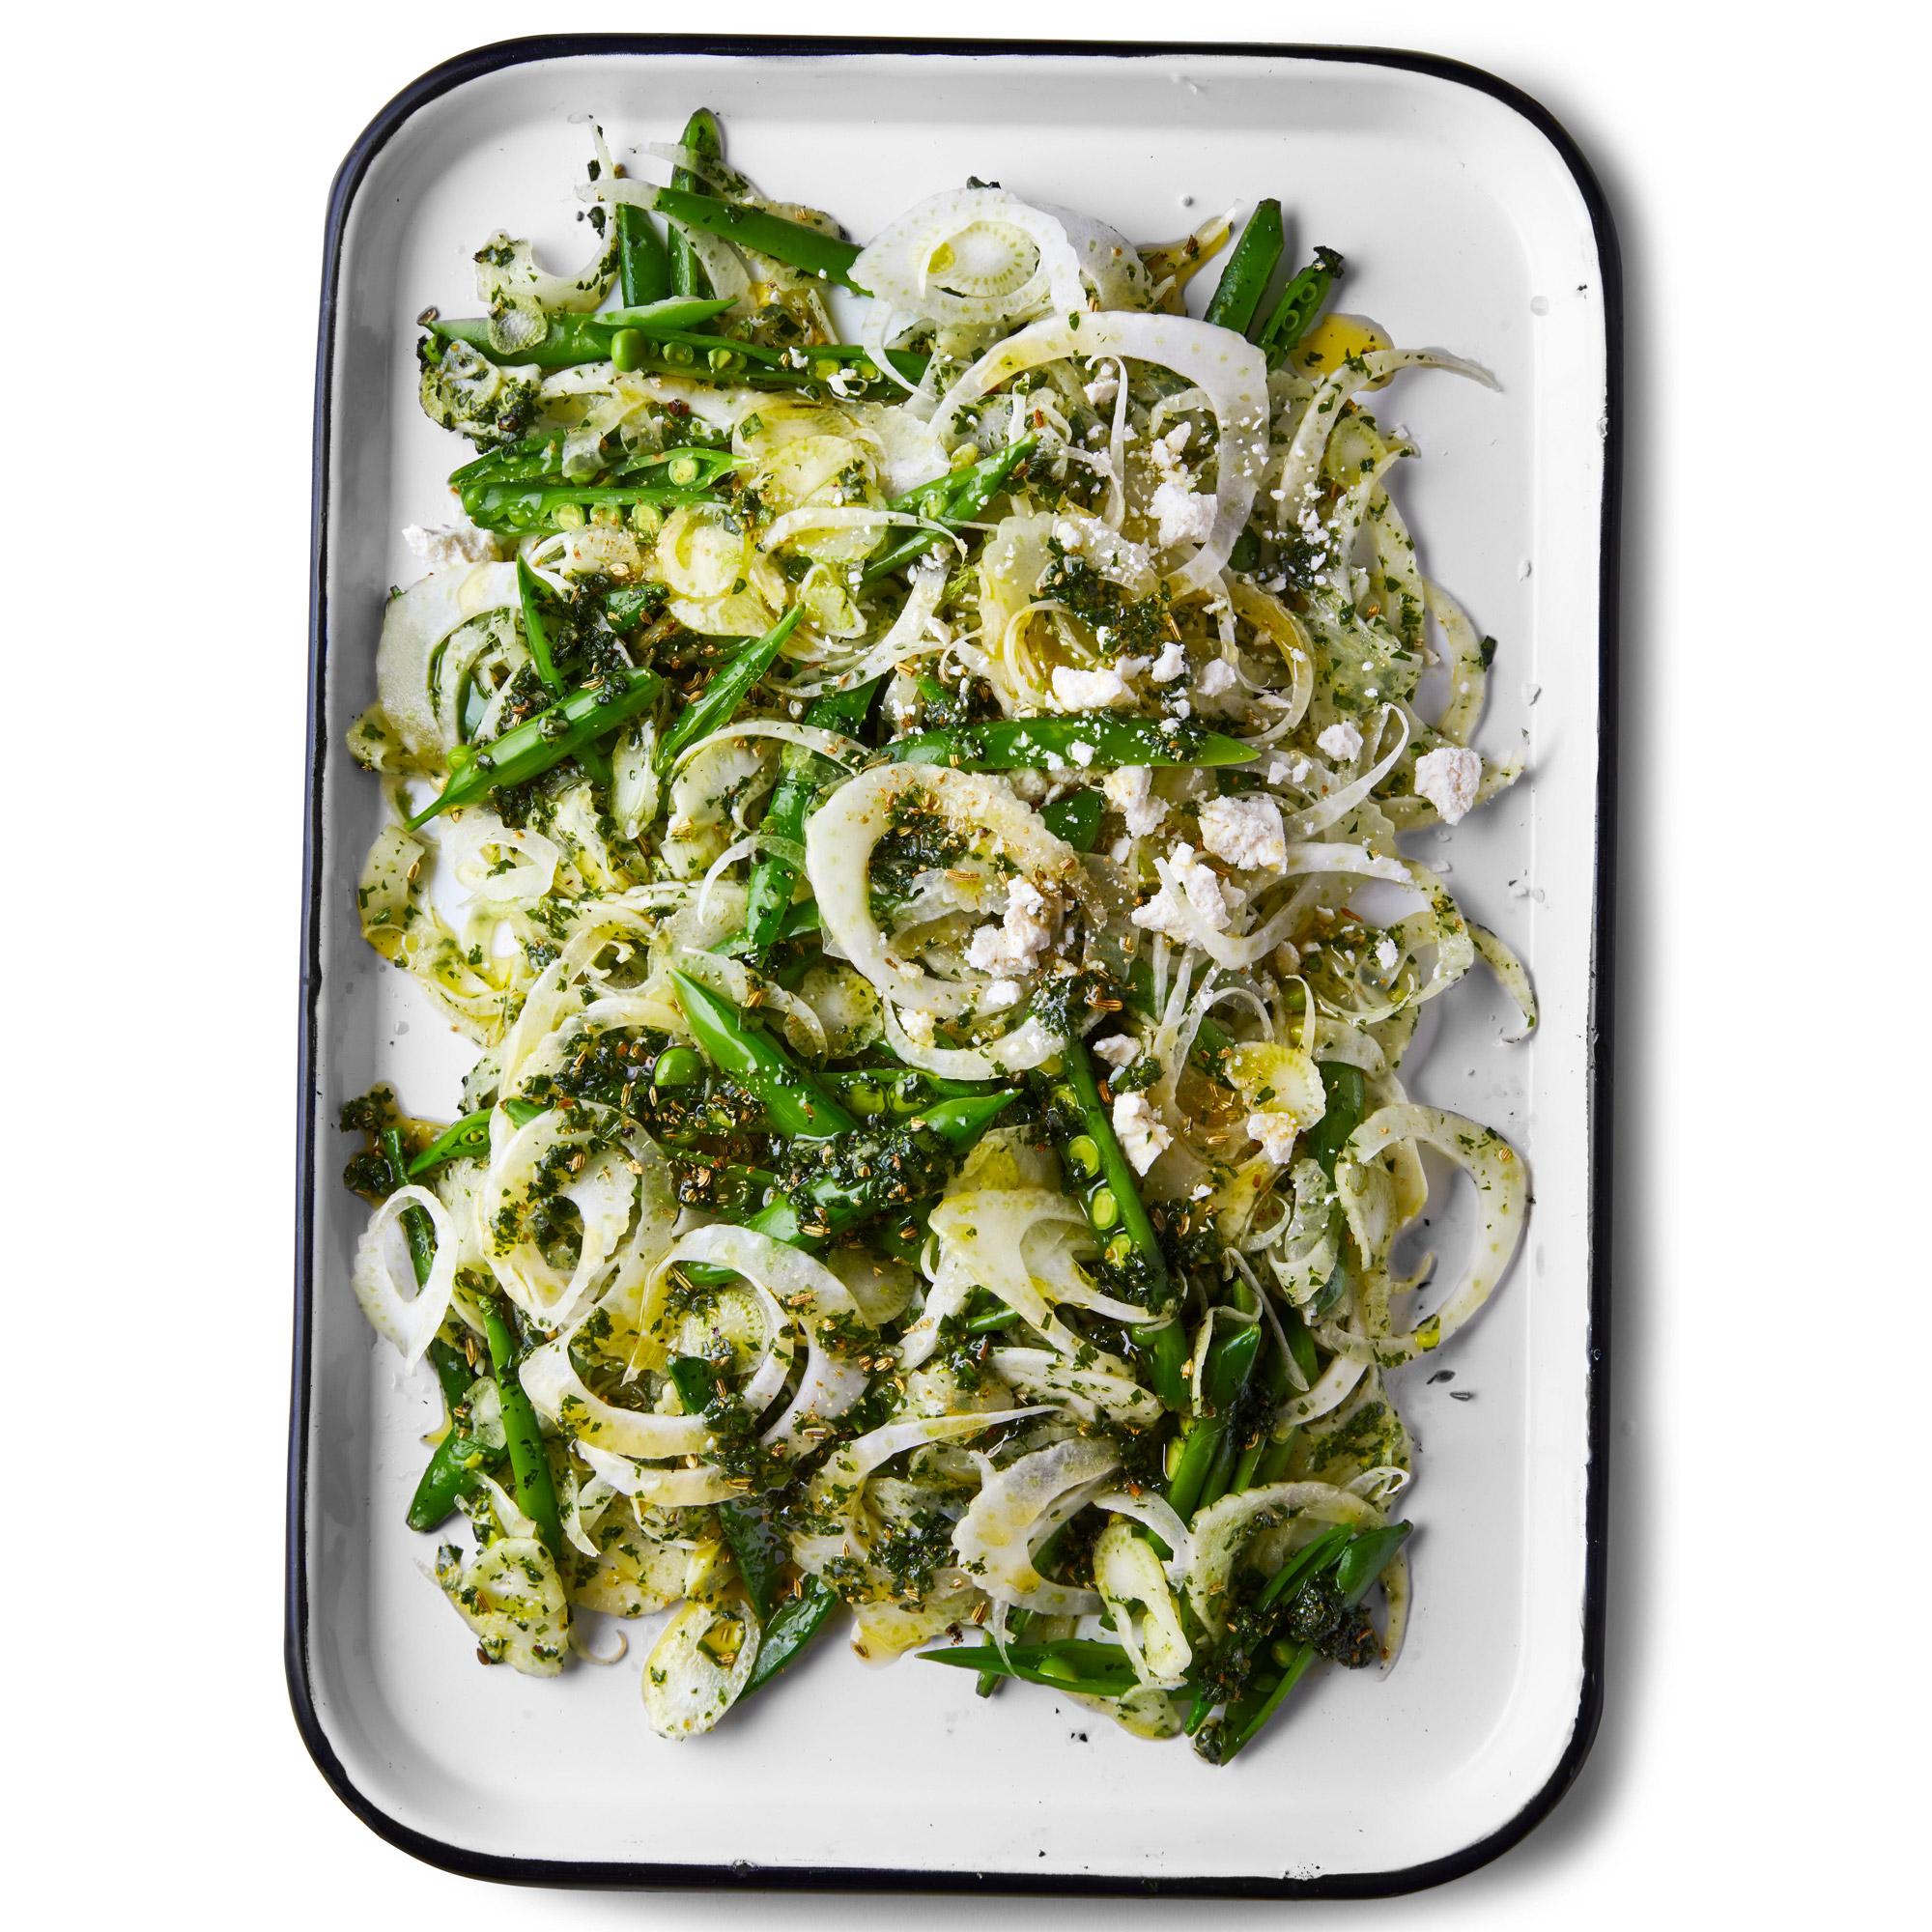 Roasted Asparagus and Gnocchi